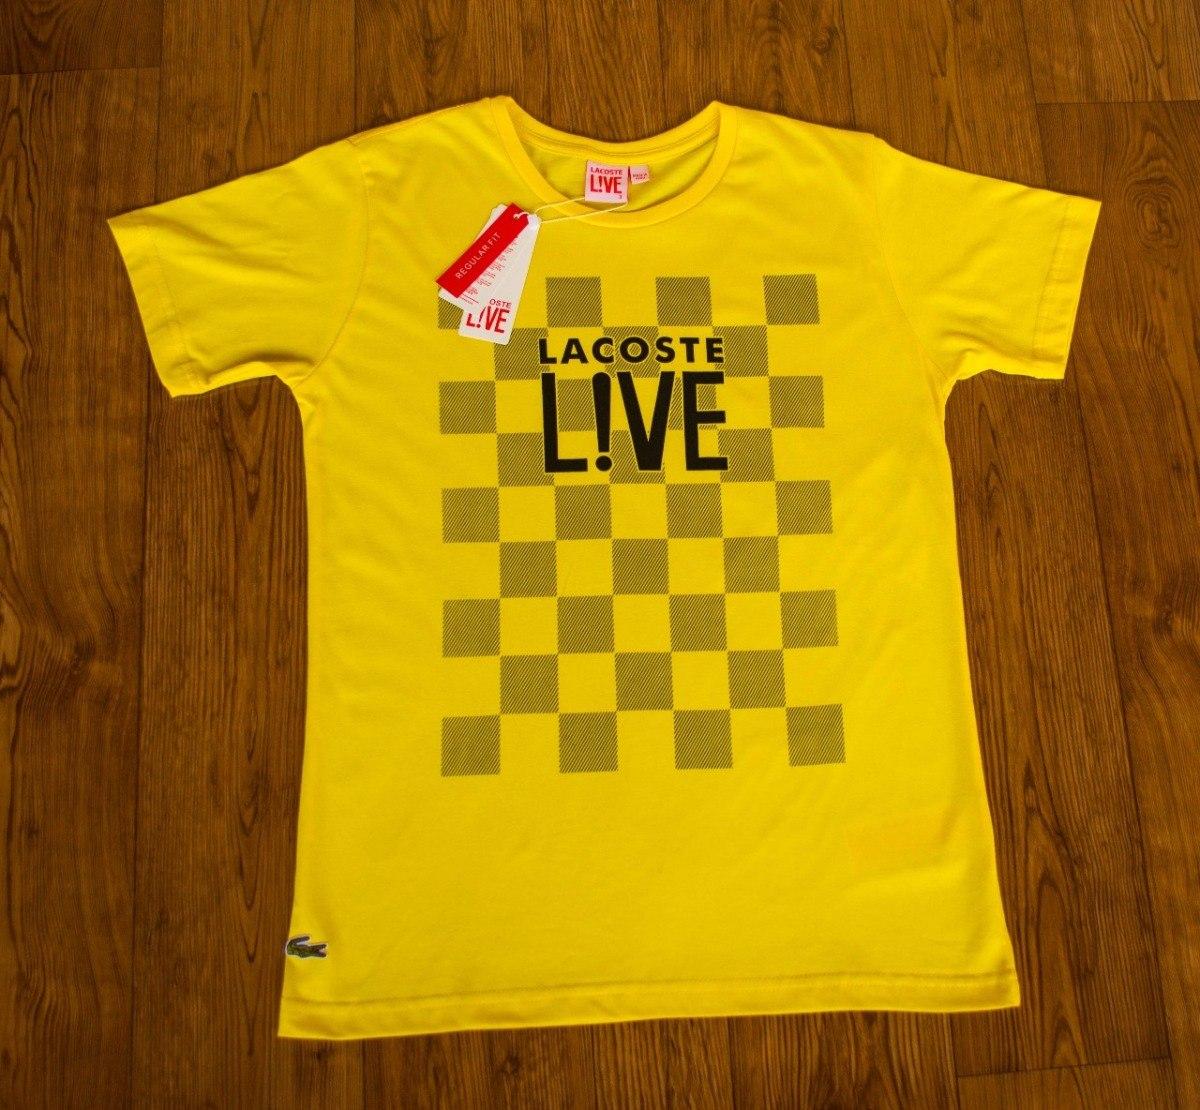 camiseta malha peruana lacoste live 6 unidades frete gratis. Carregando  zoom. 2831dd66d2